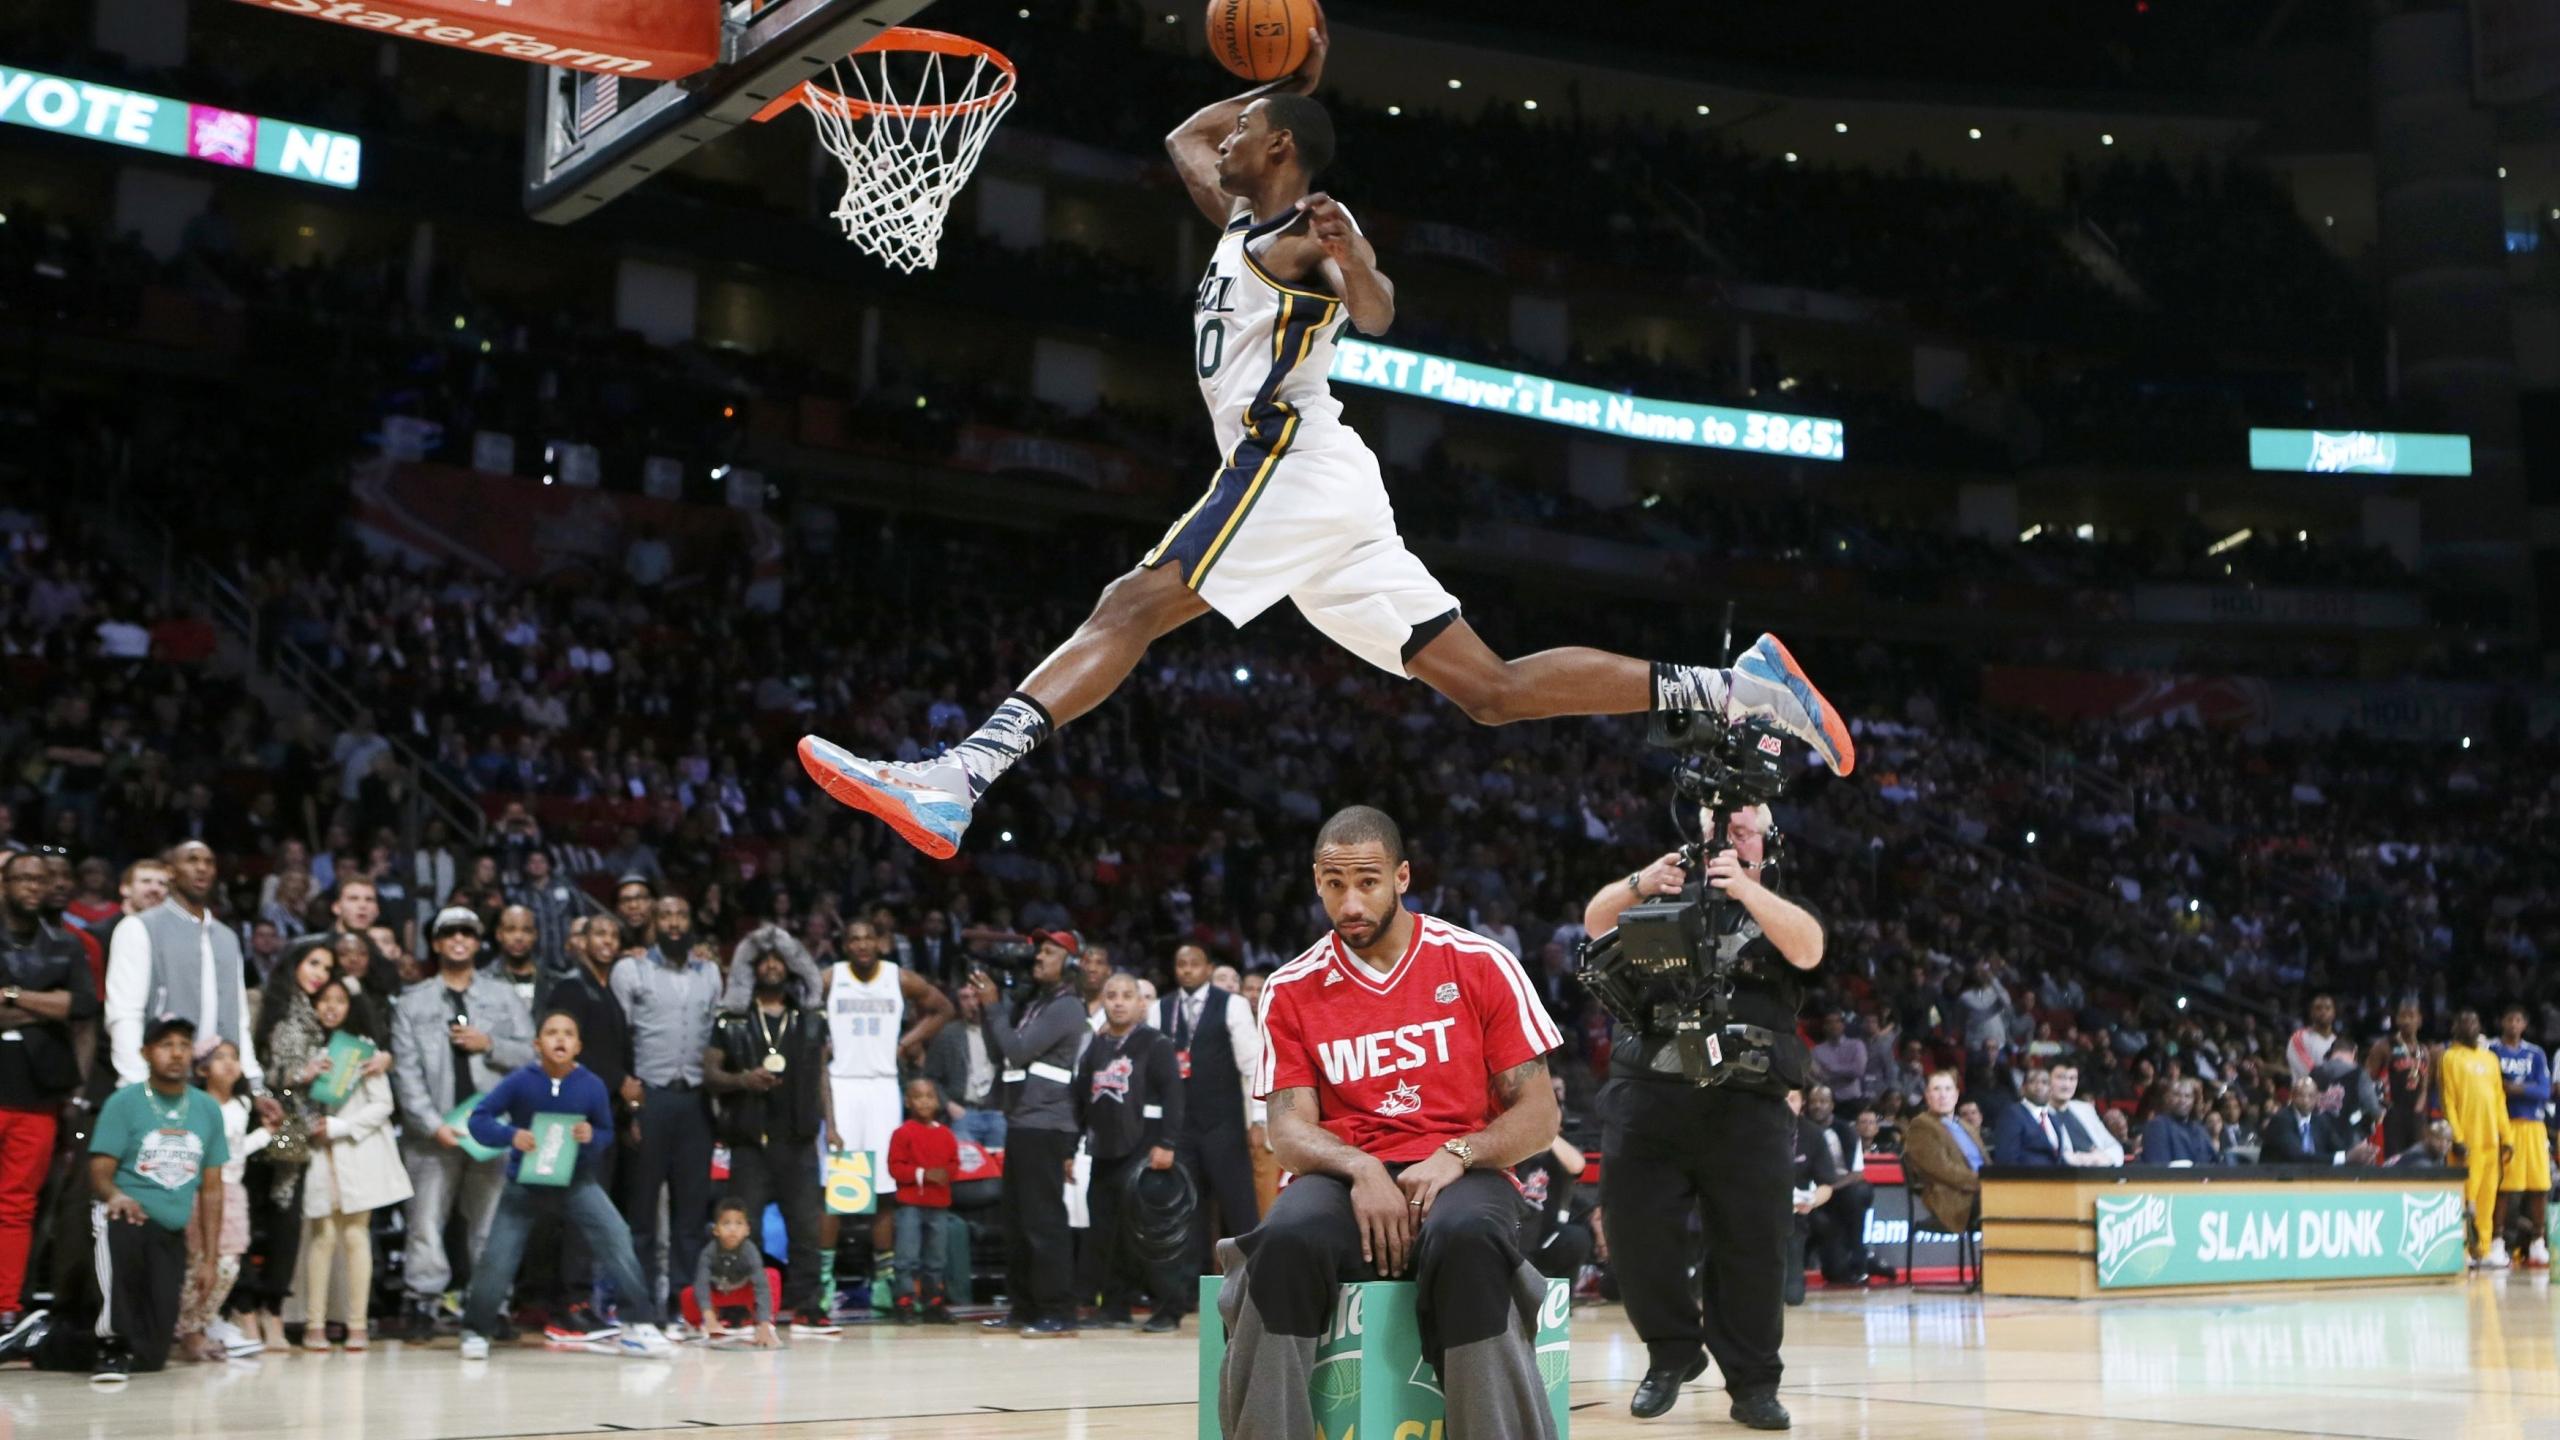 2560x1440 jeremy evans, basketball player, nba 1440P ...